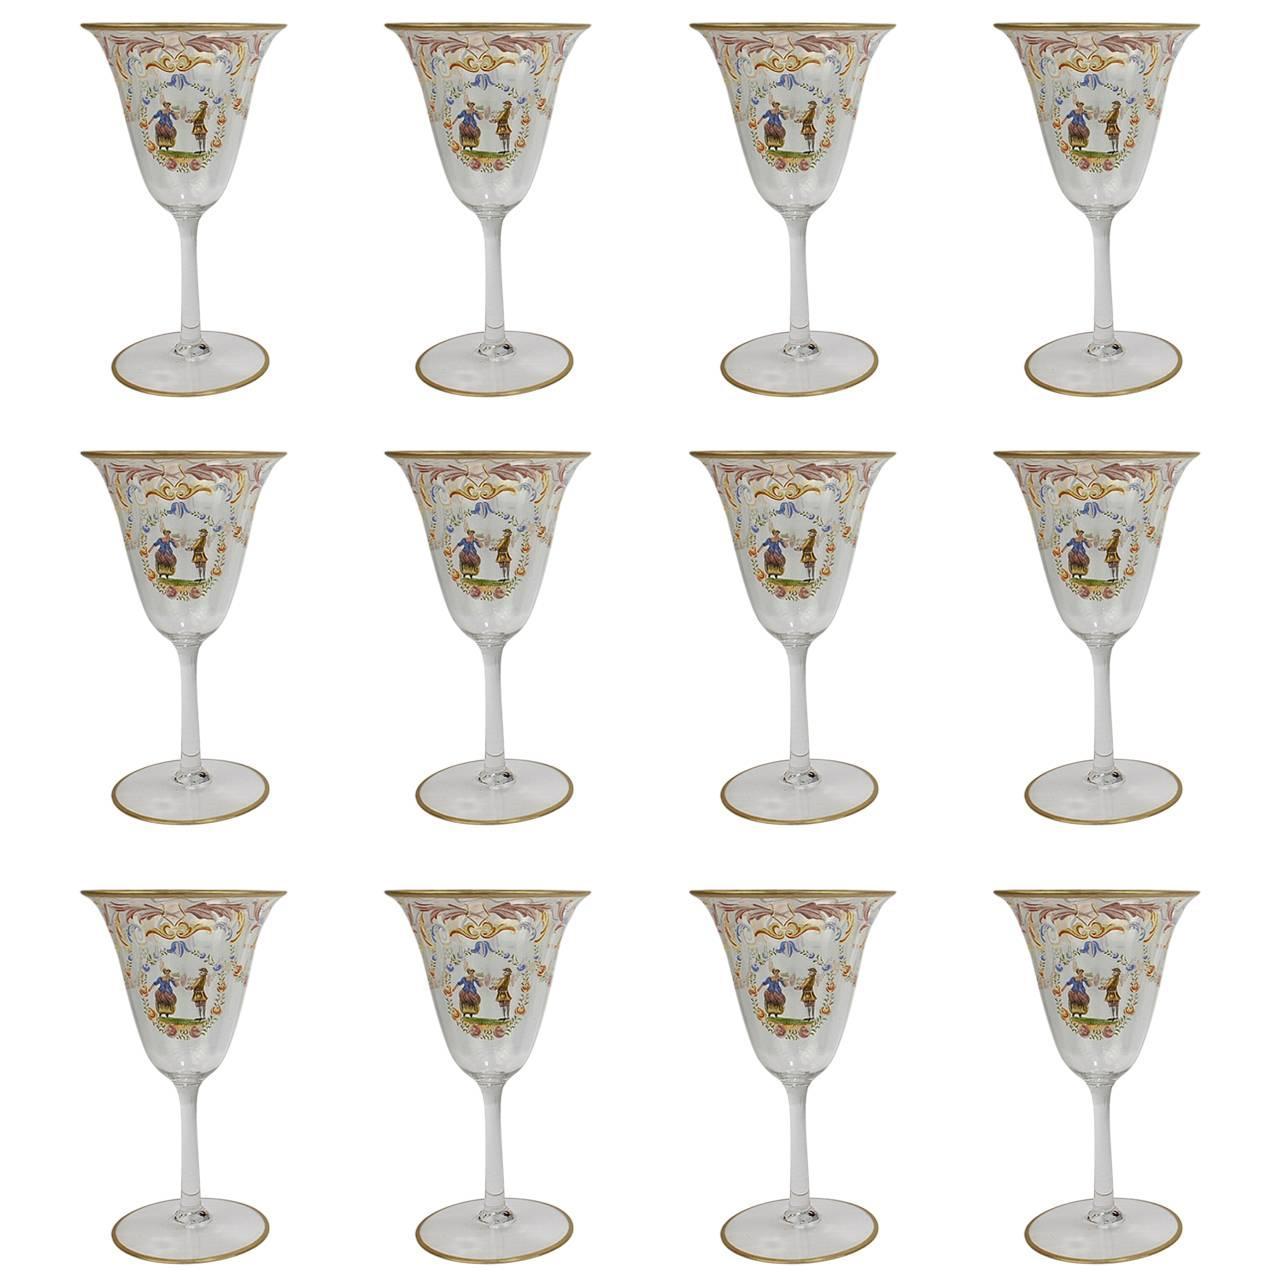 Set of 12 Enameled Venetian Glass Wine or Water Goblets, 1930s